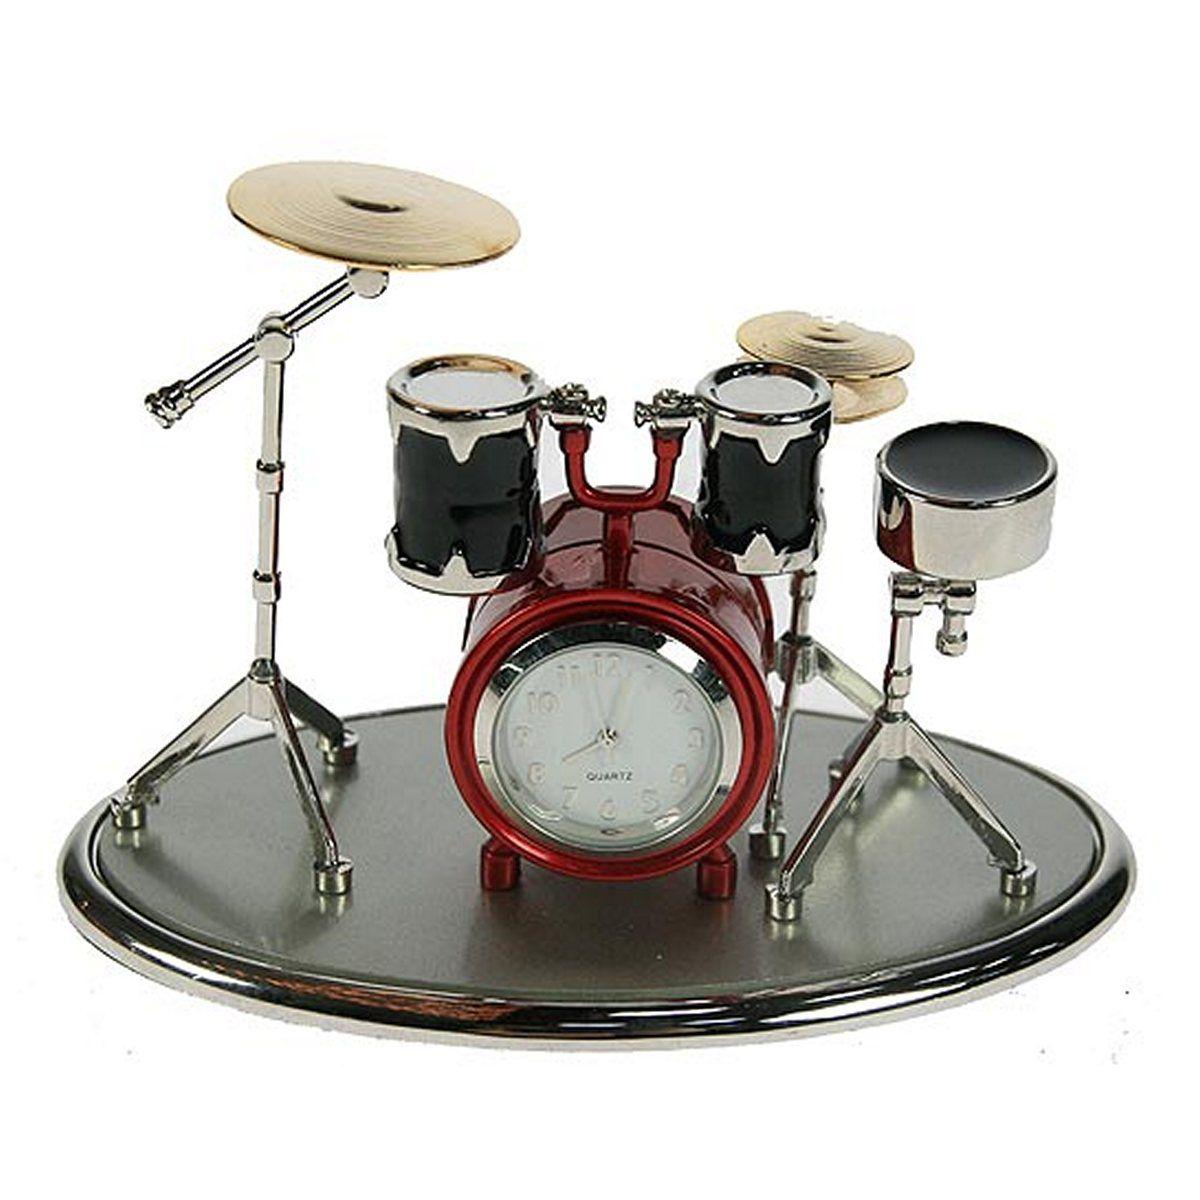 Часы настольные Русские Подарки Музыкальная группа, 12 х 8 х 9 см. 22403 статуэтка русские подарки африканка 12 х 9 х 34 см